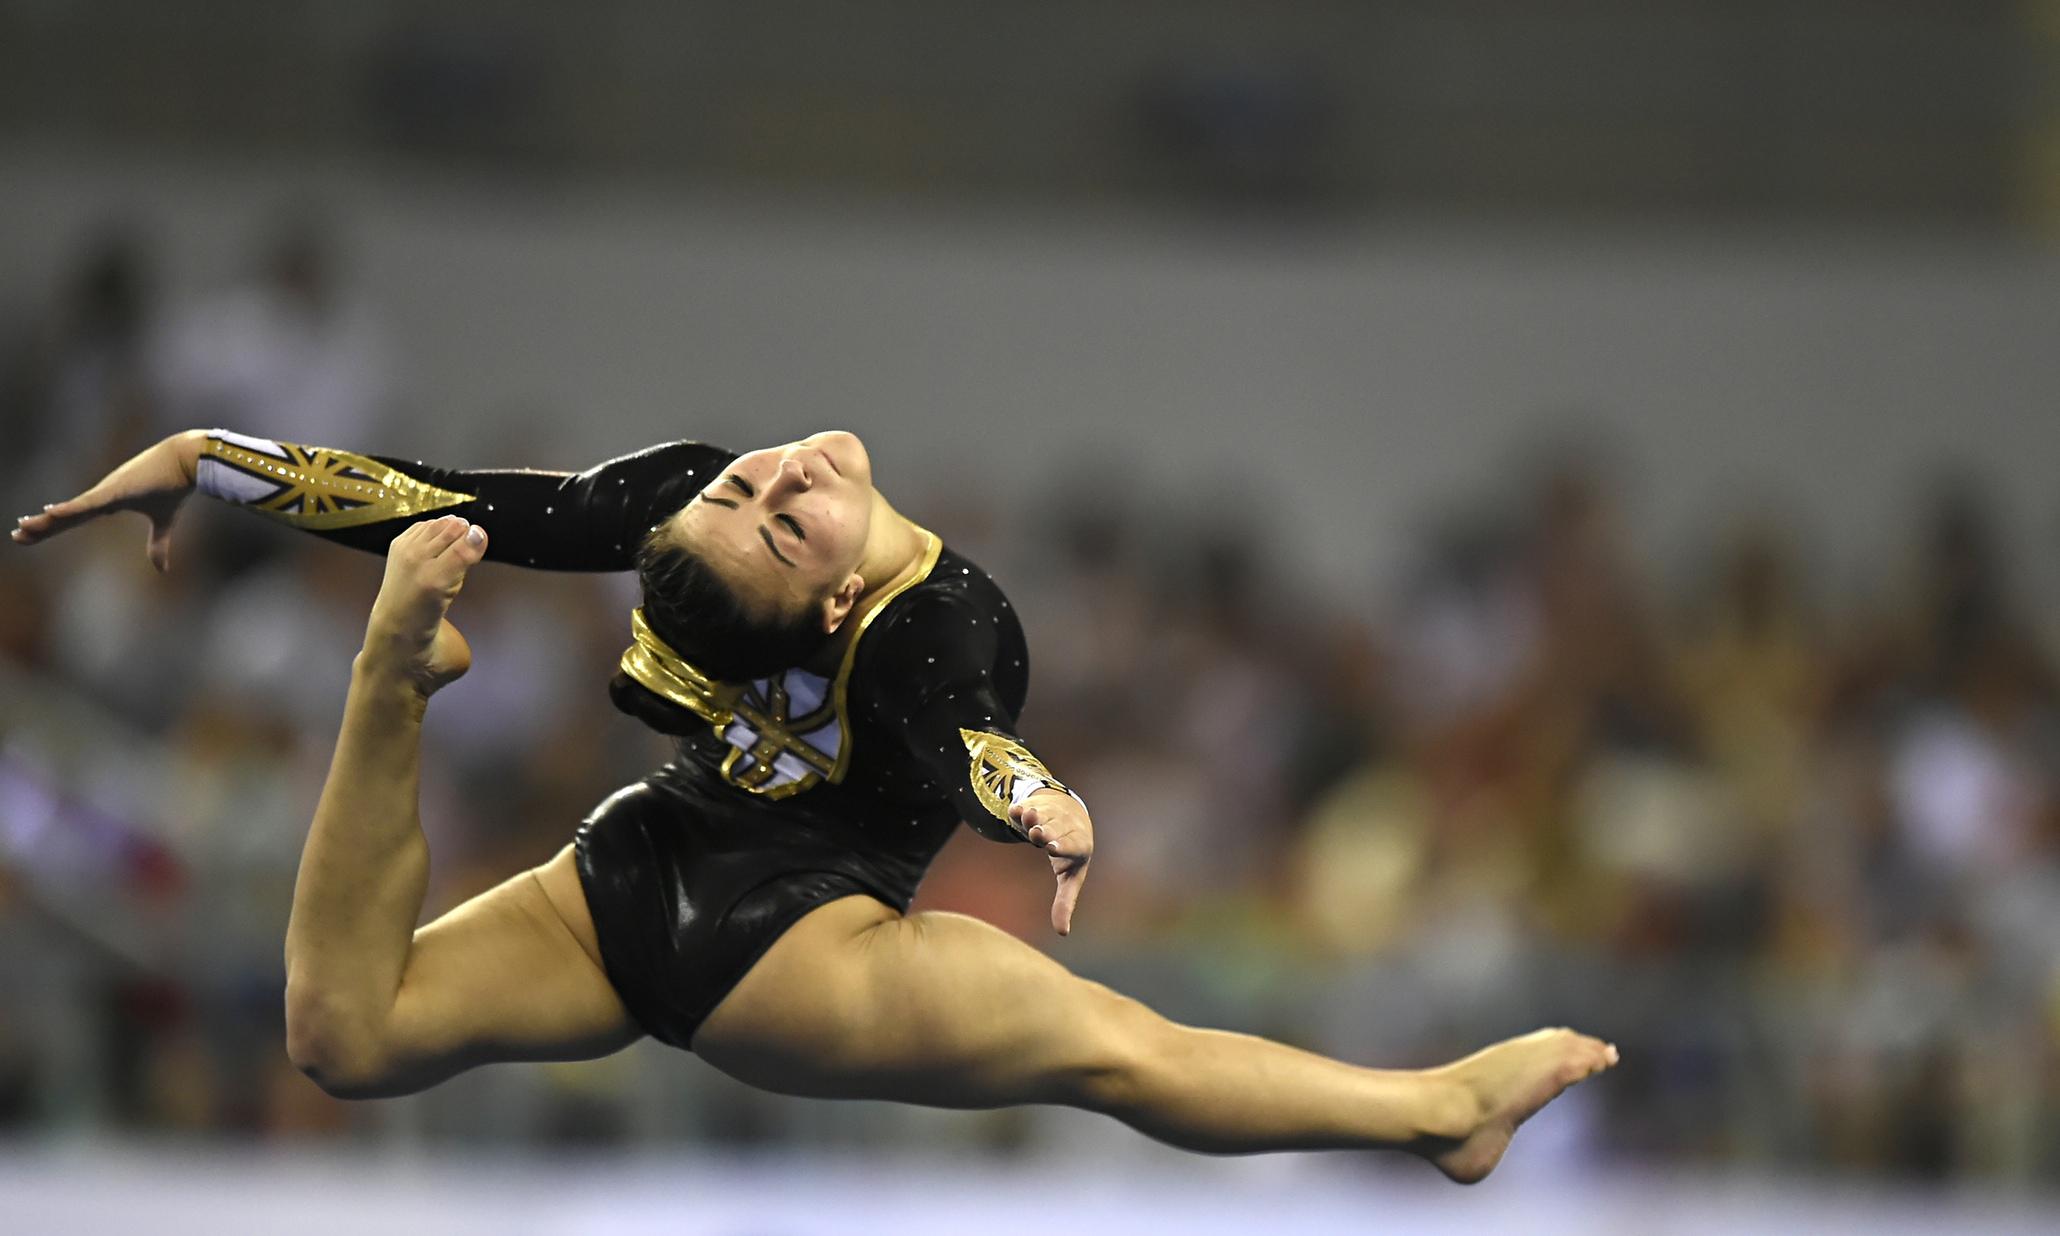 Claudia Fragapane Hopes To Floor Rival Gymnasts At British Championships Sport The Guardian